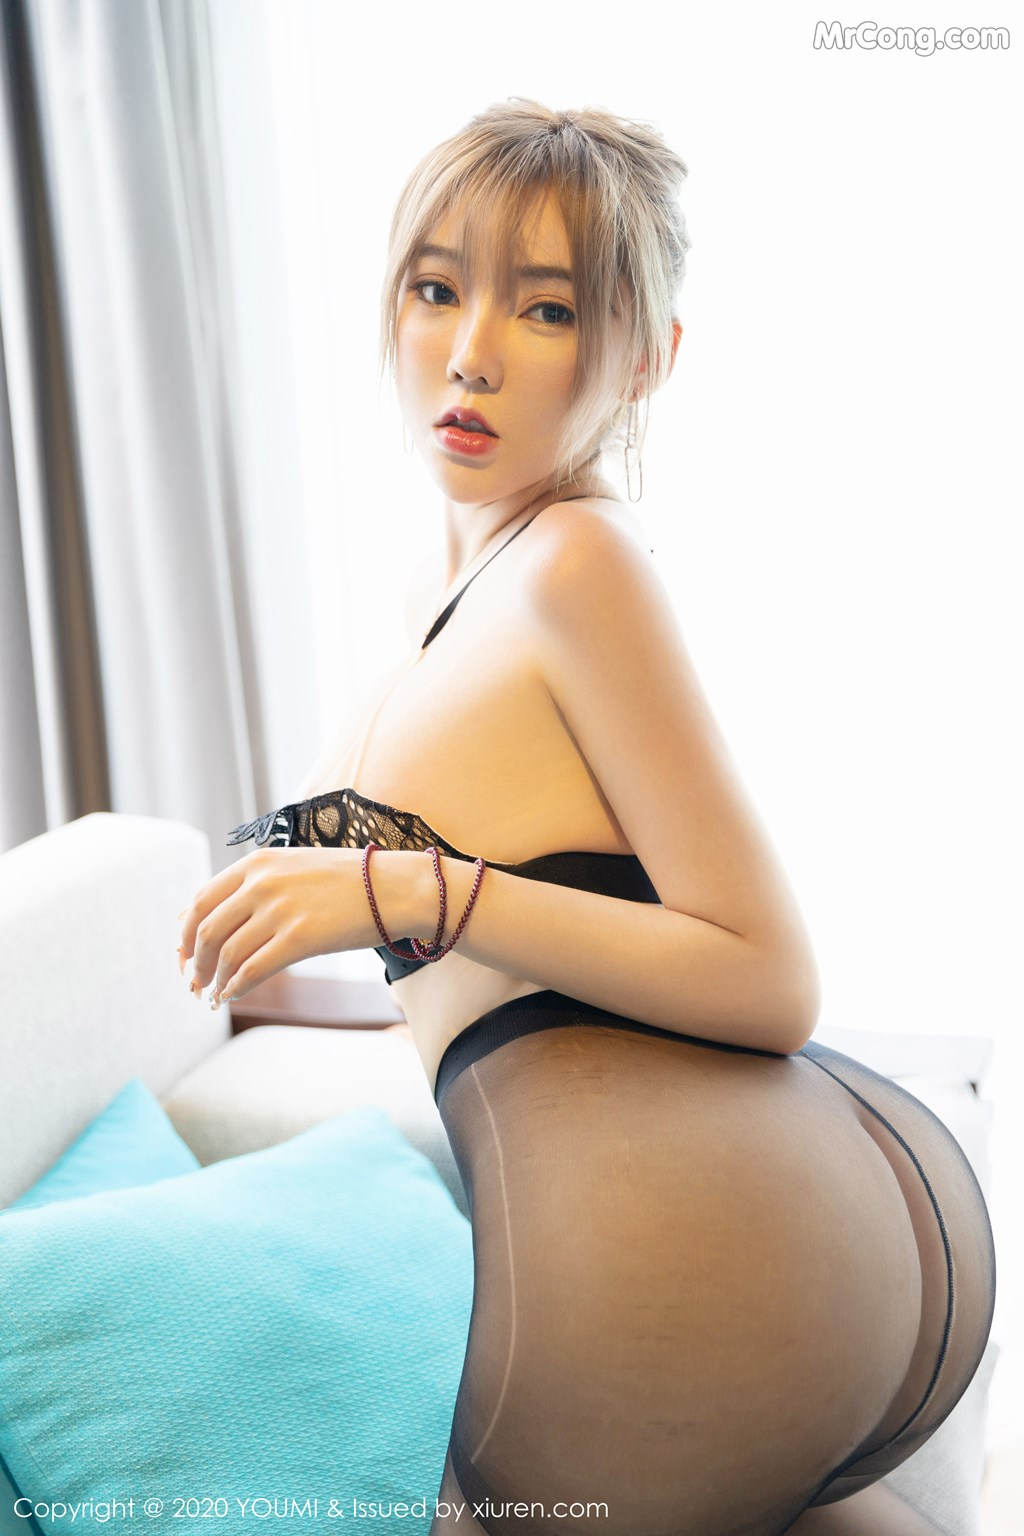 YouMi Vol.441: Chai Wan Yi (柴婉艺Averie) (37P)